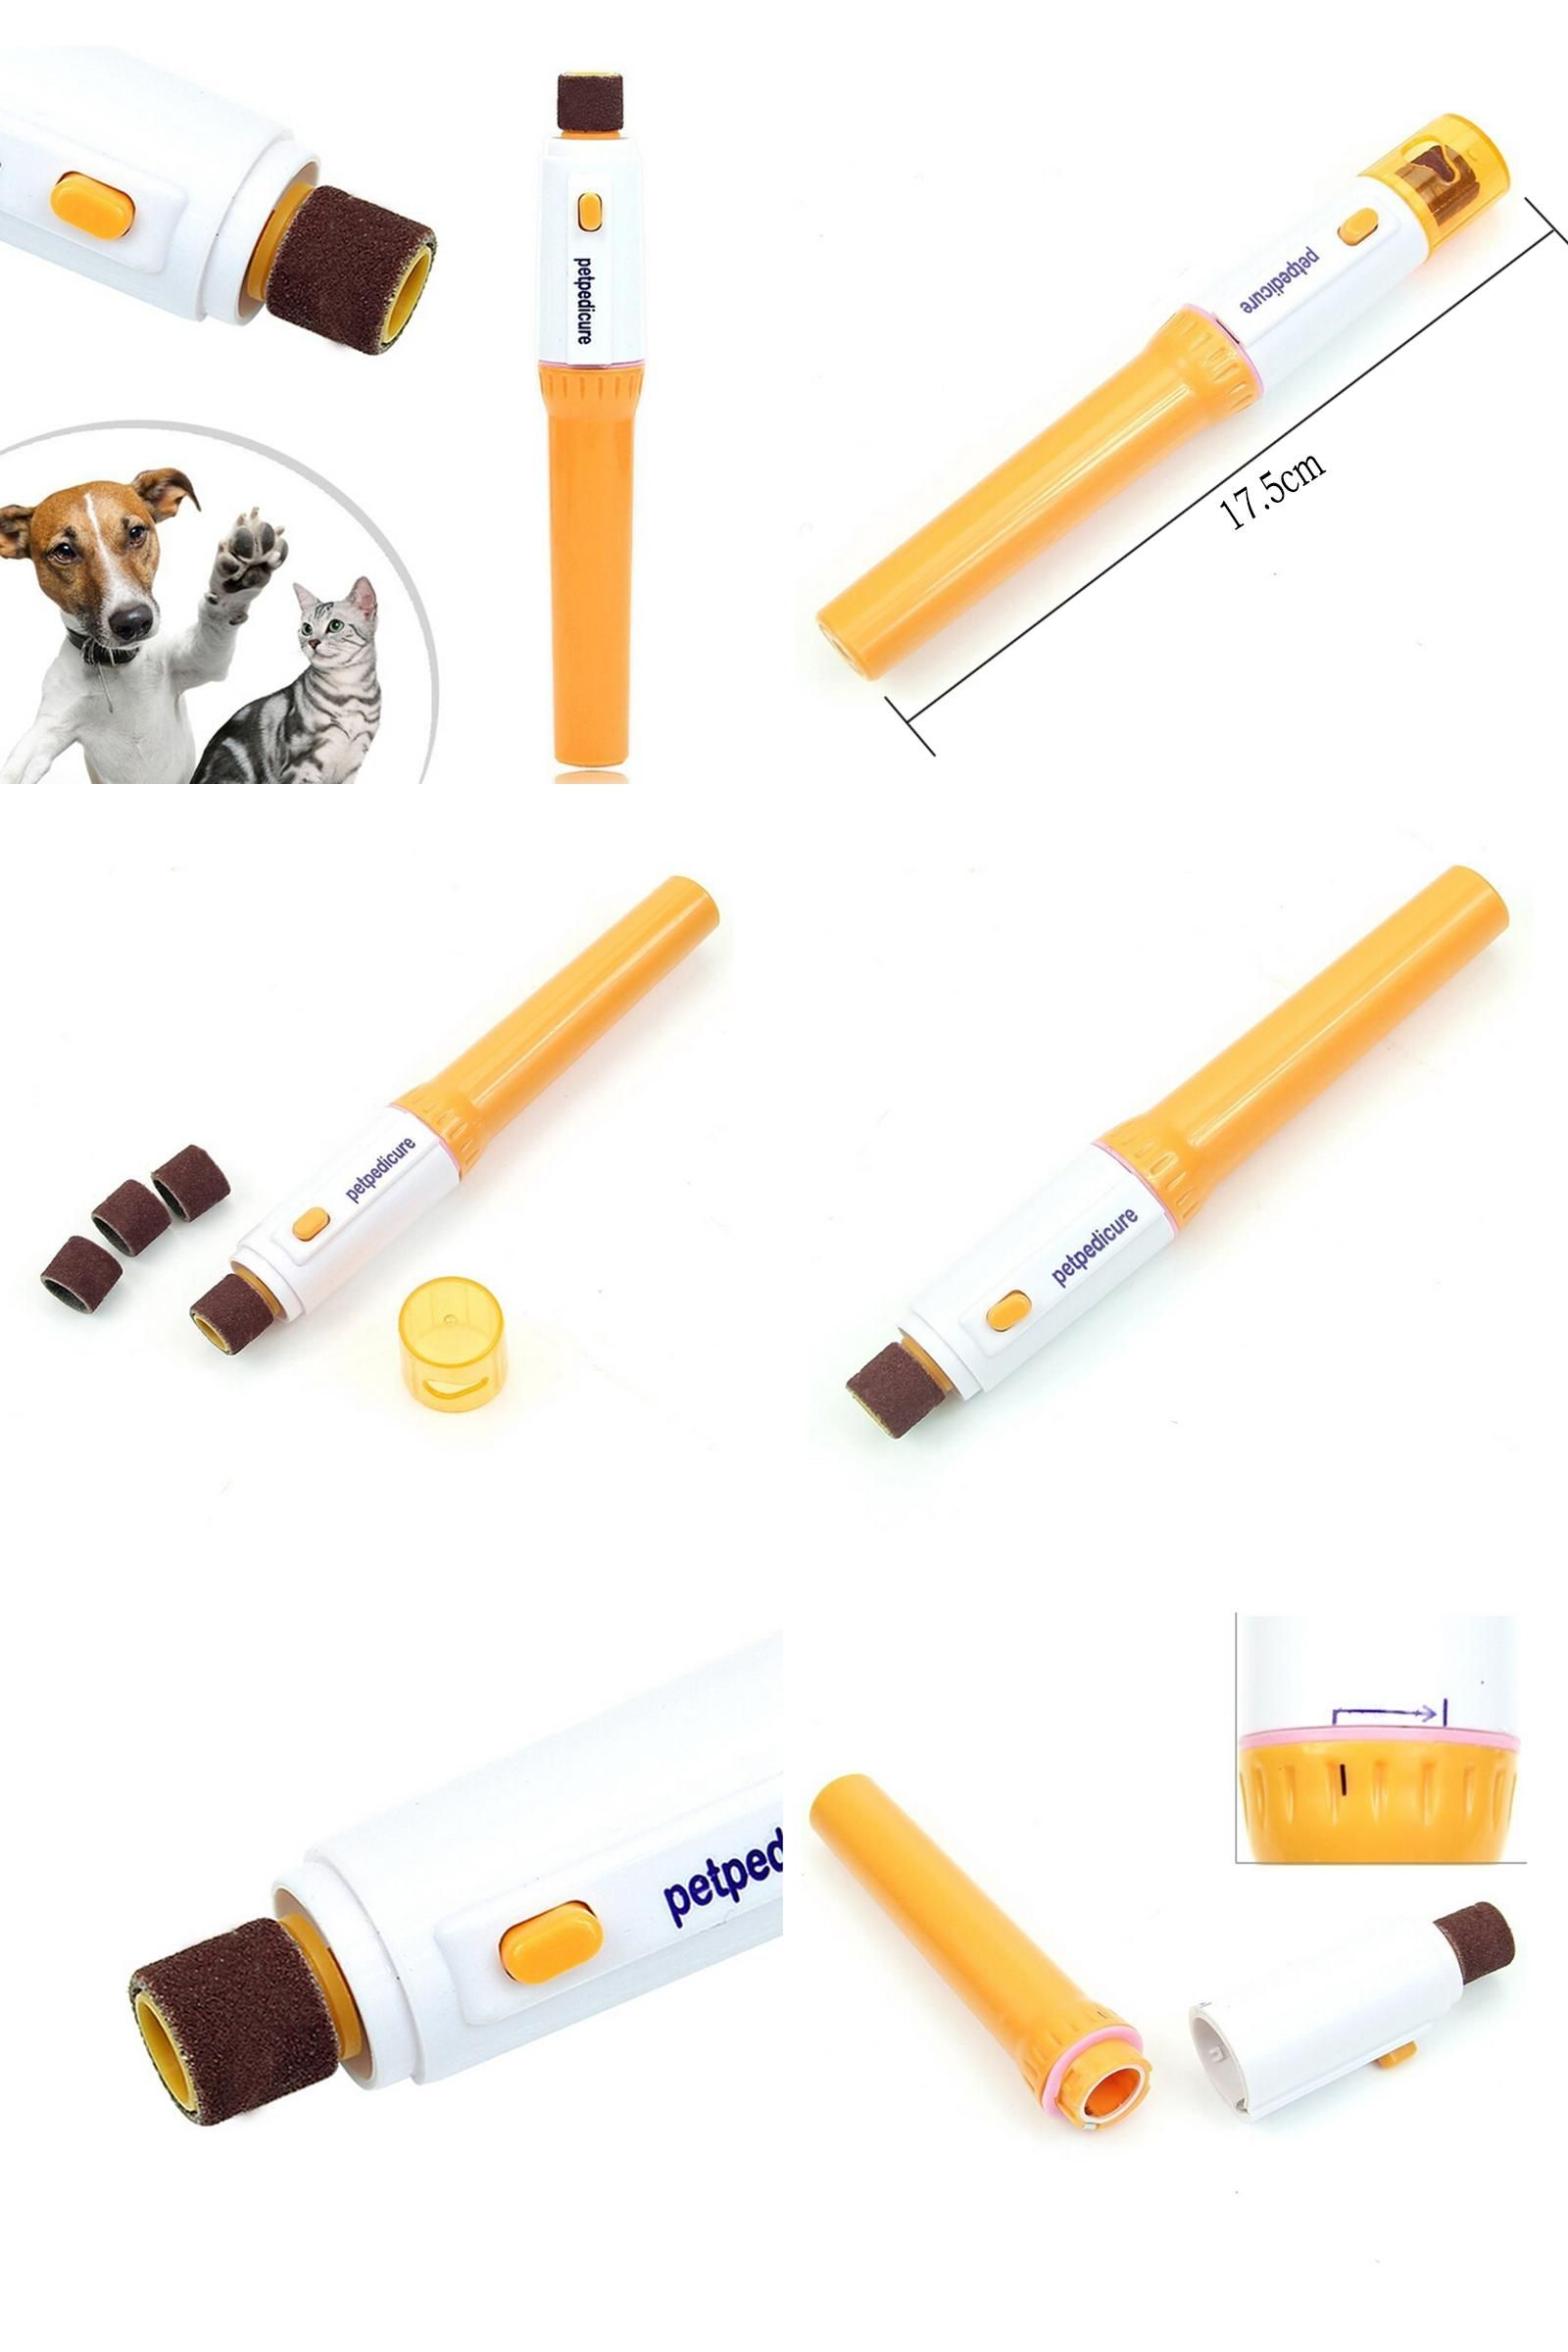 [Visit to Buy] Electric Pet Pedicure Nail Trimmer Pet Nail